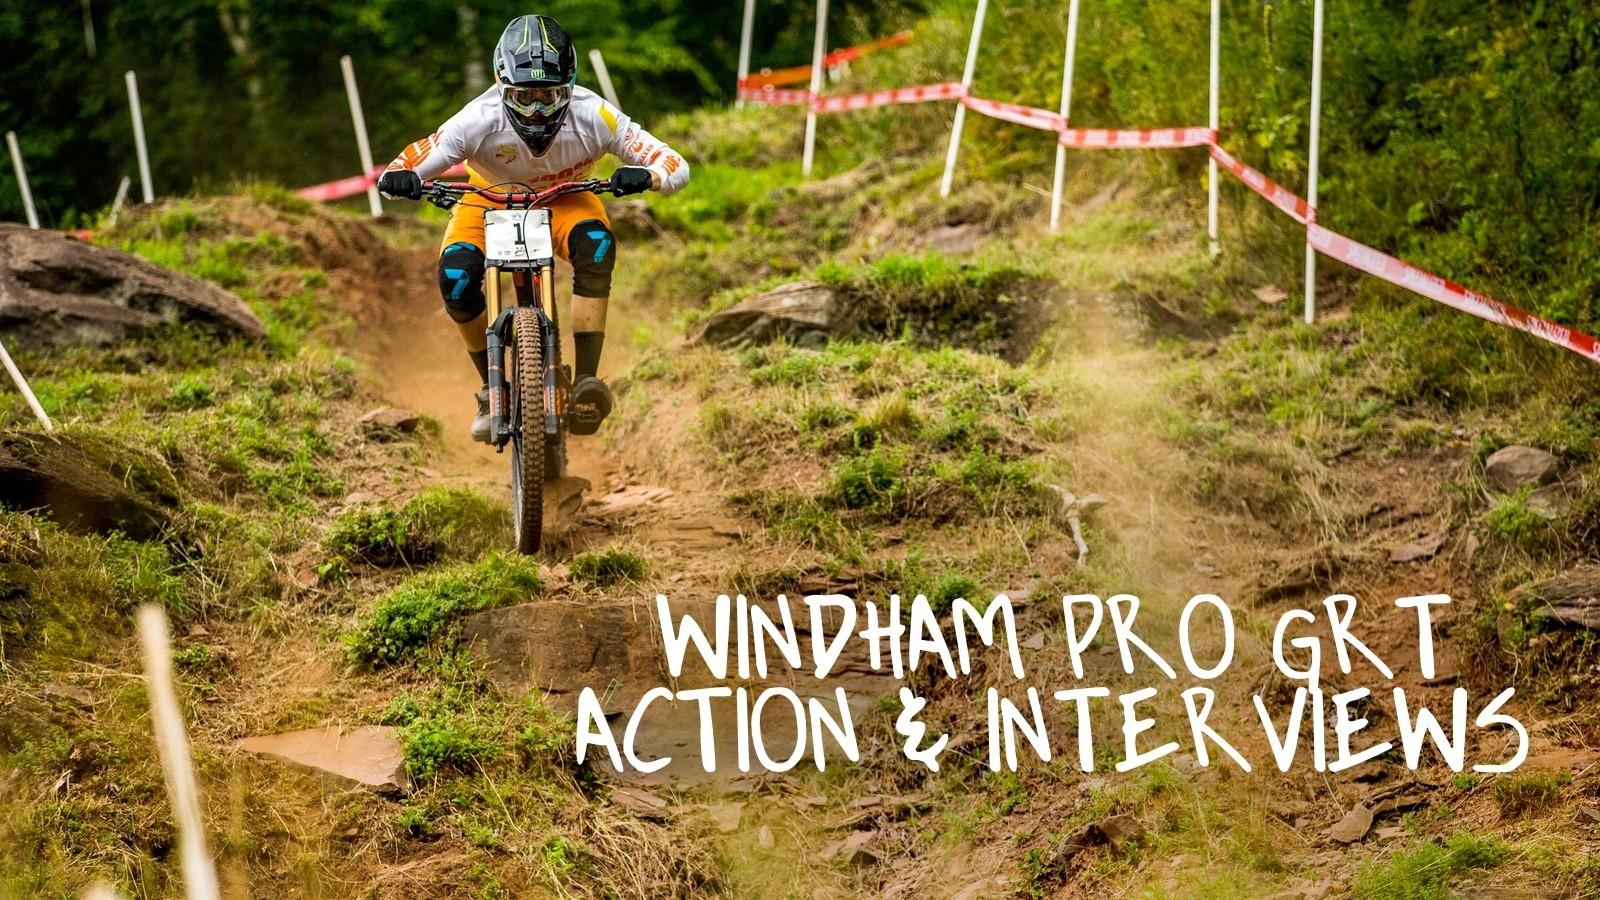 Pro GRT Windham Downhill Action & Interviews